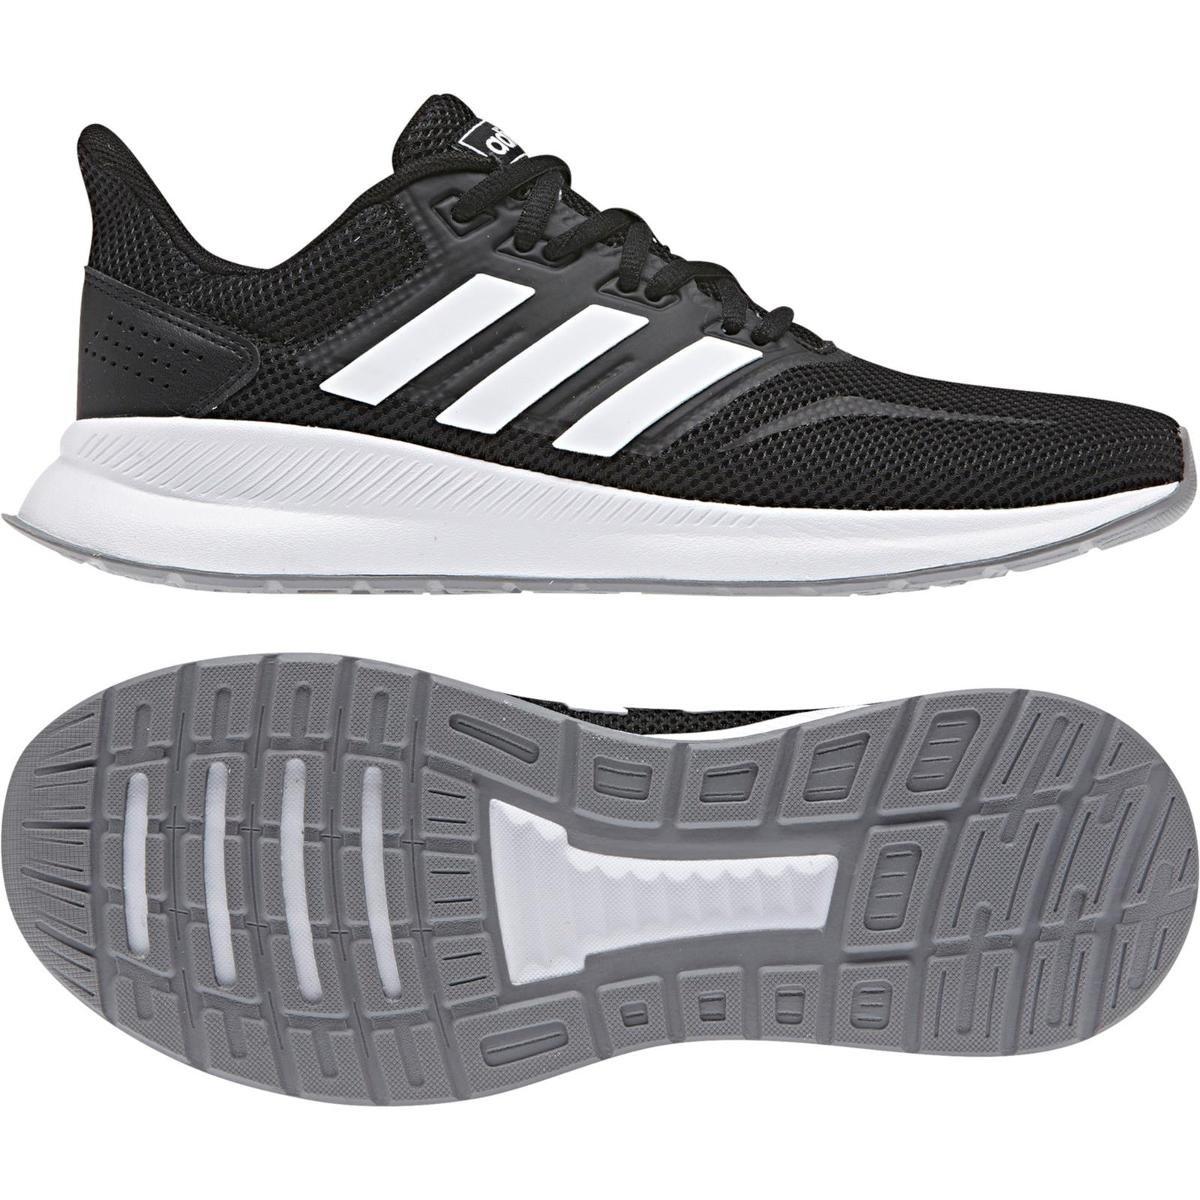 Adidas, Buty damskie, Runfalcon F36218, rozmiar 36